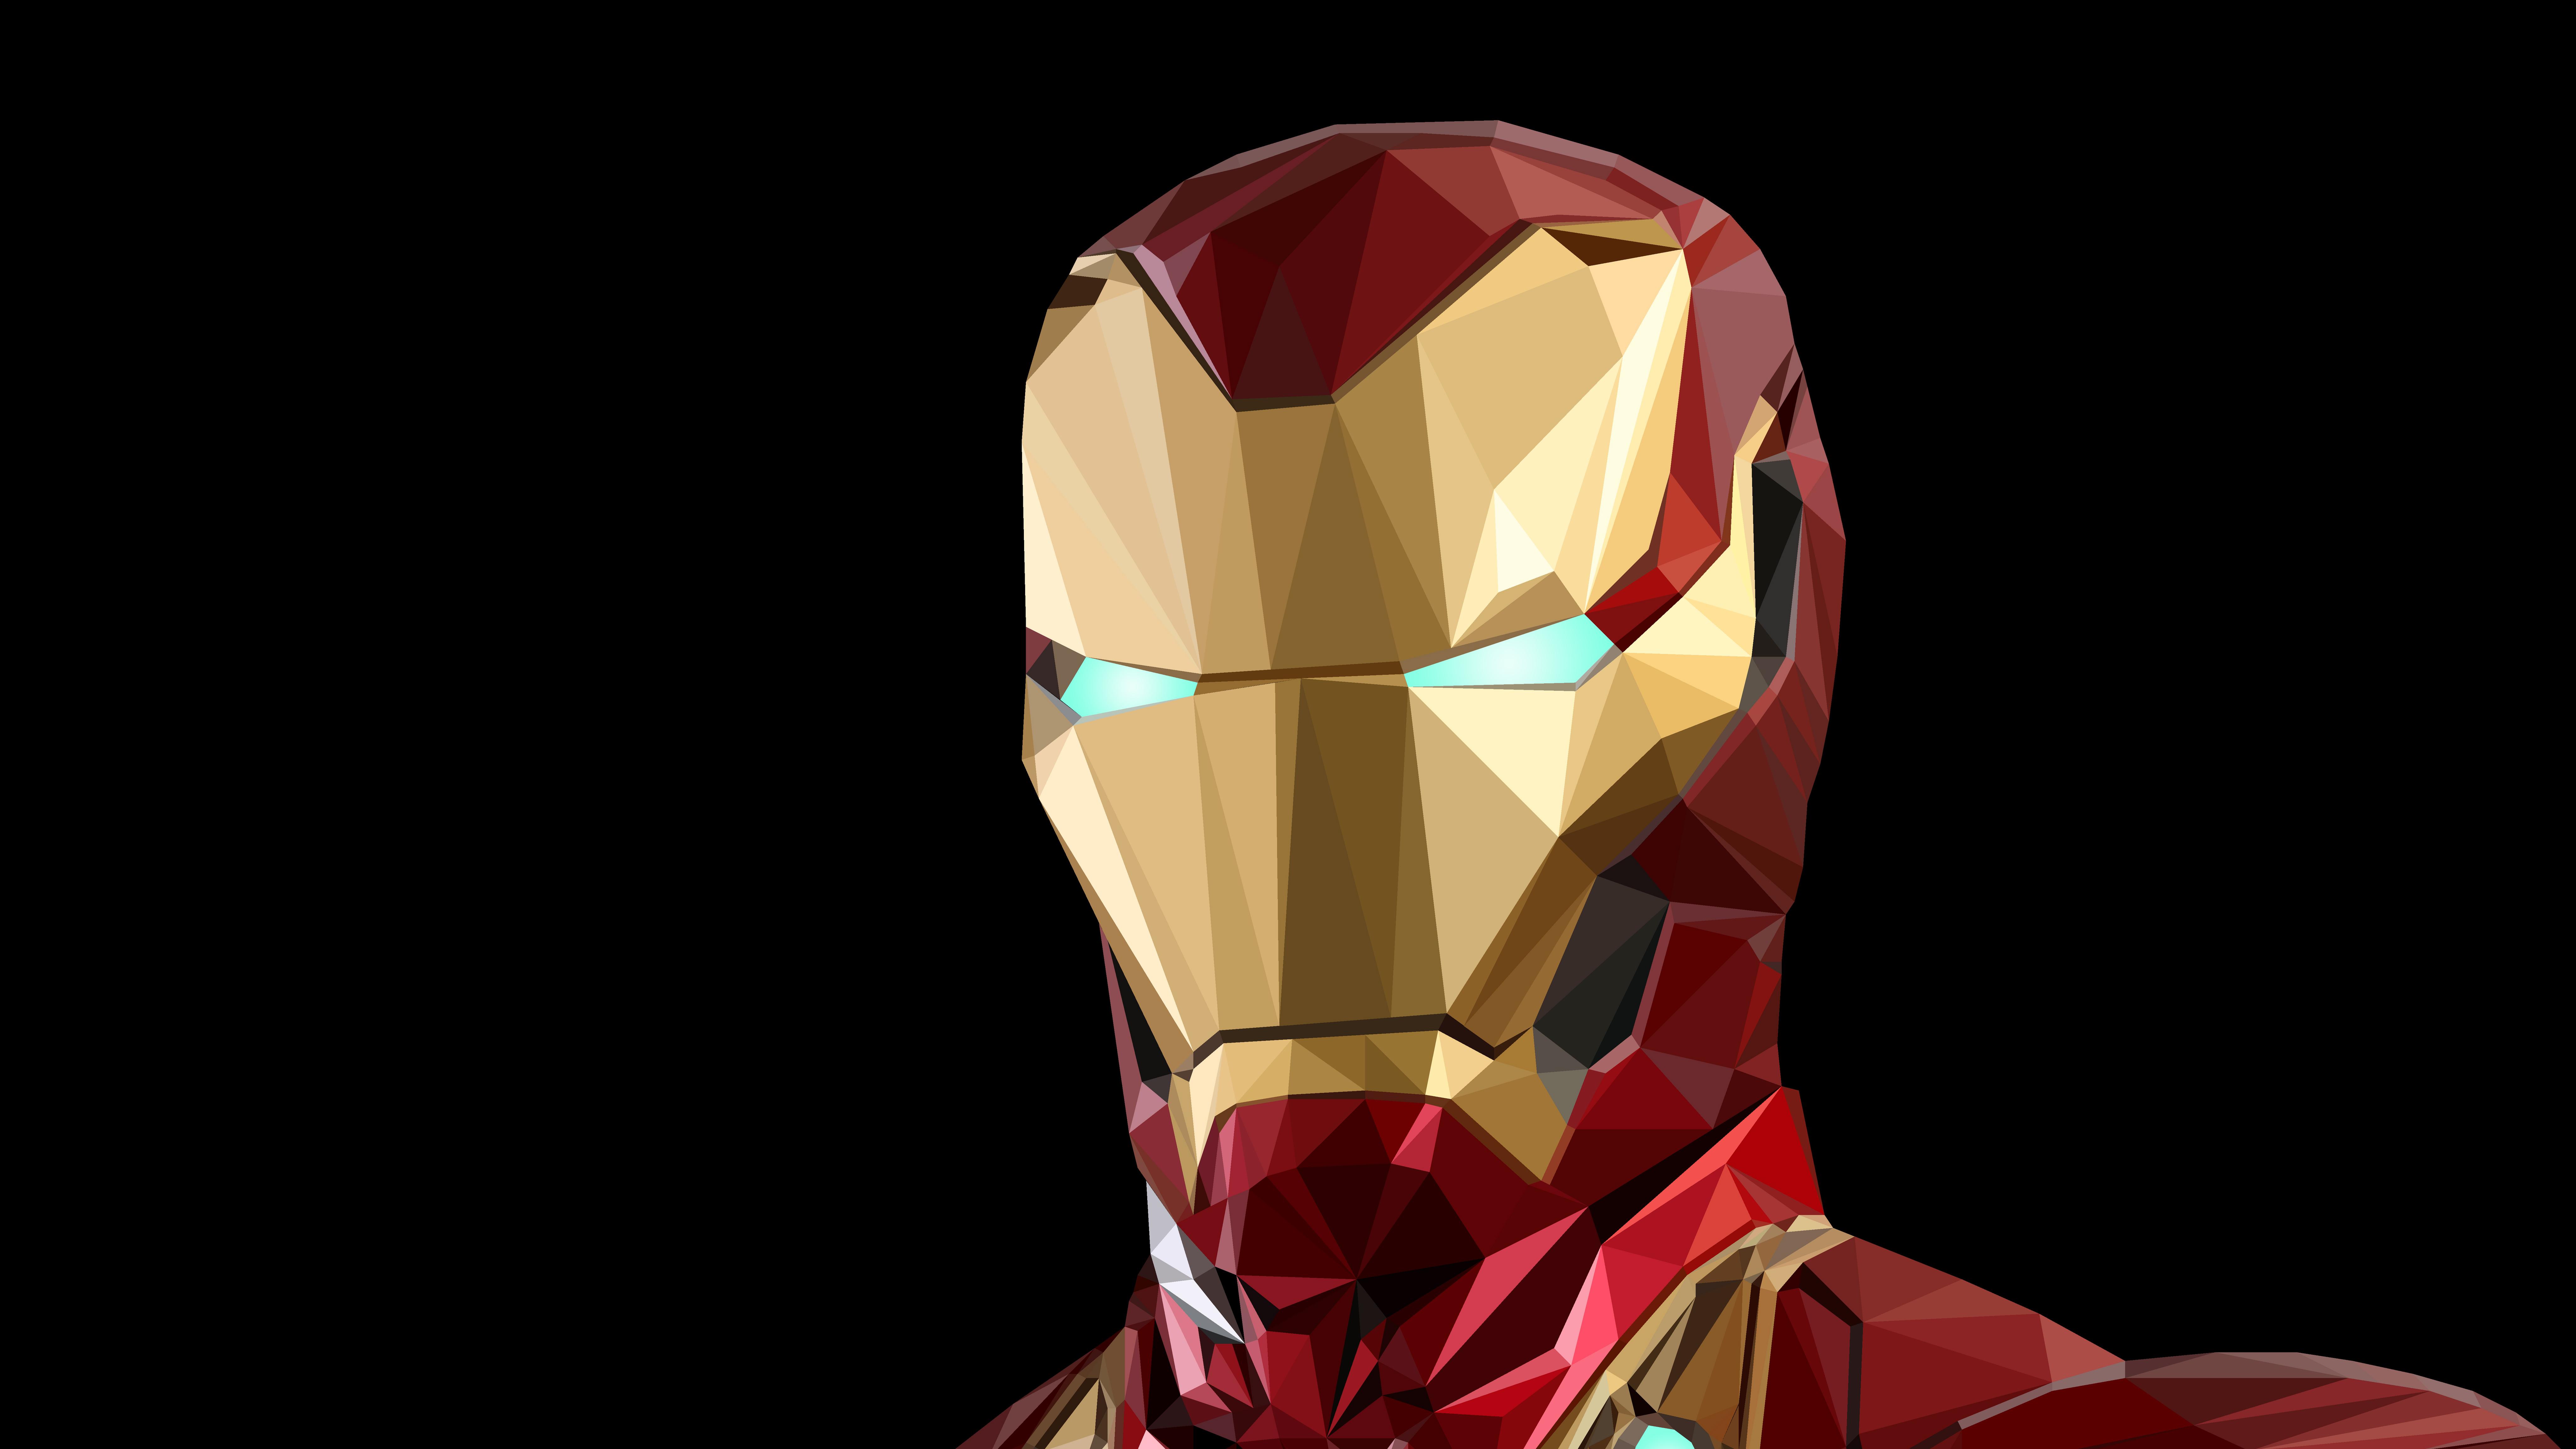 Iron Man Oled 8k Hd Superheroes 4k Wallpapers Images